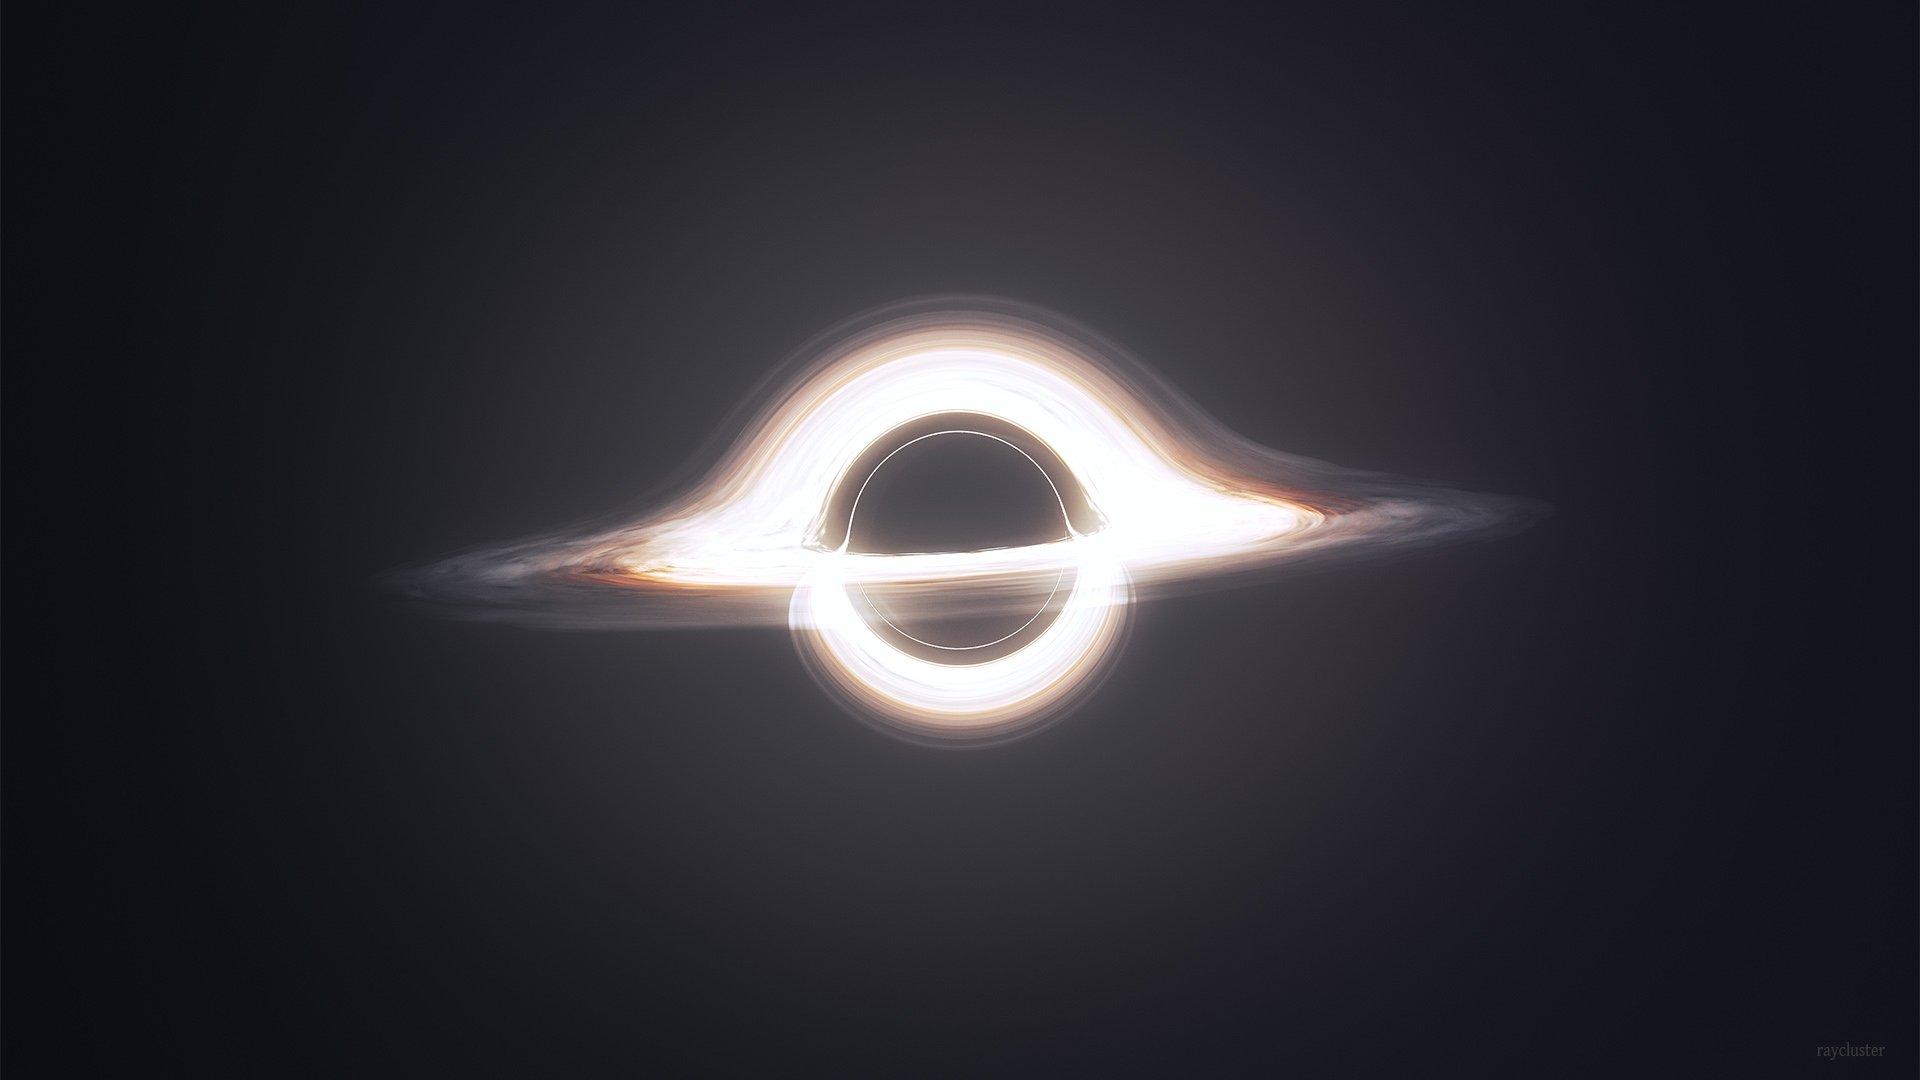 2560x1440 black hole - photo #27